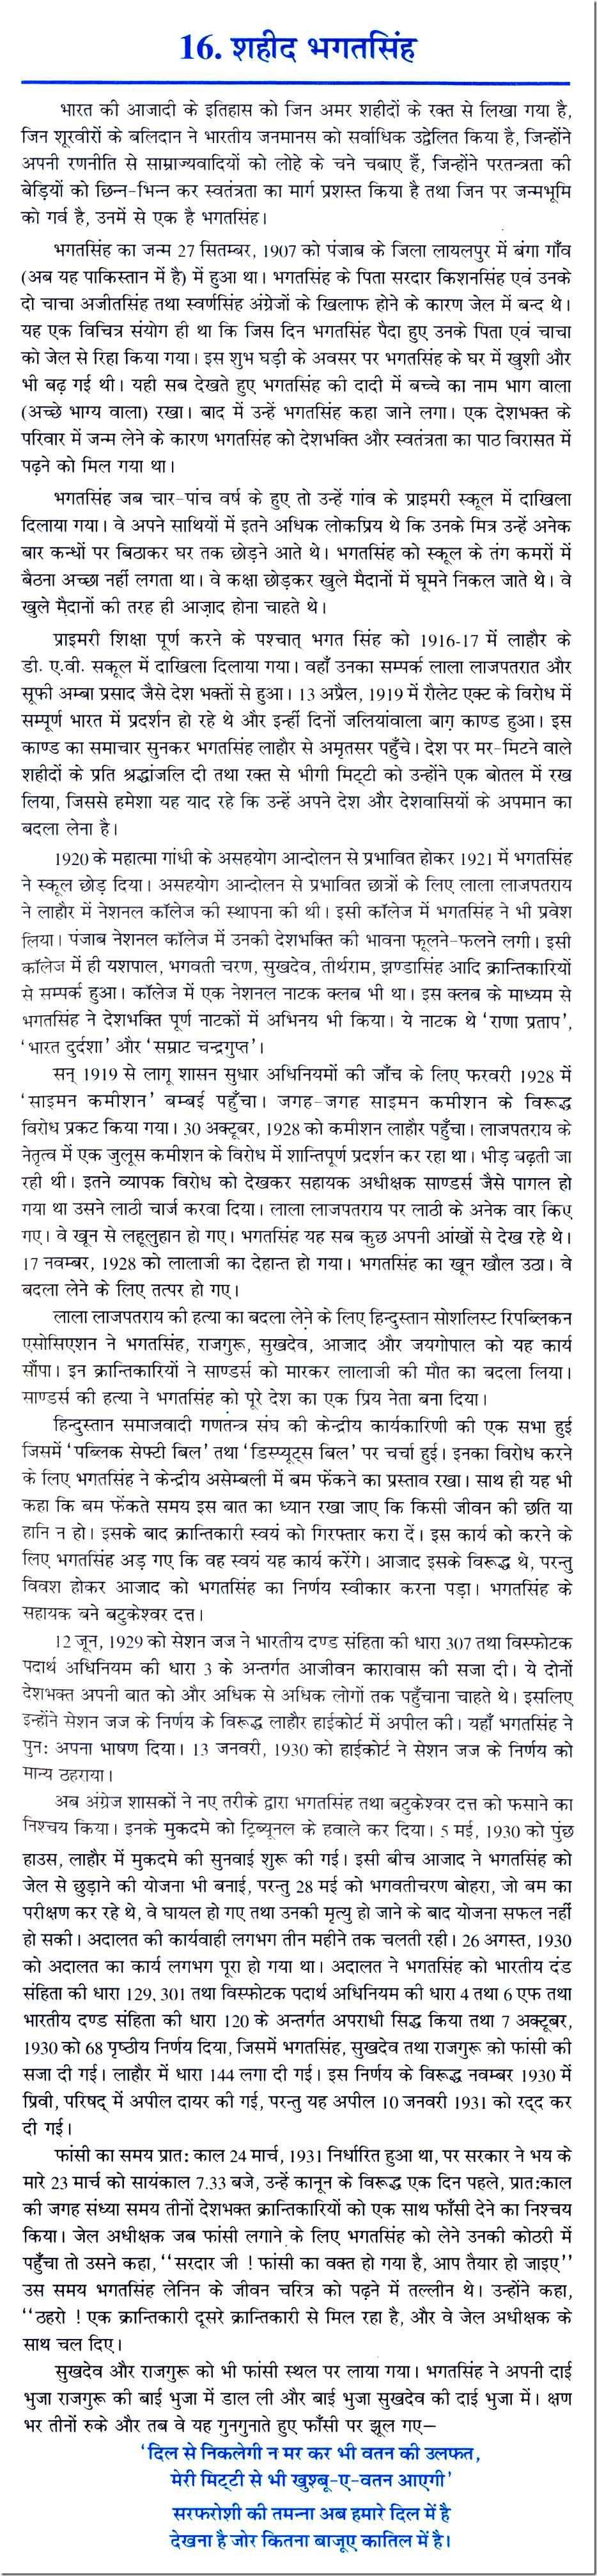 015 0020016 Thumb Essay Example On Bhagat Singh In Unique Marathi Short 100 Words Full